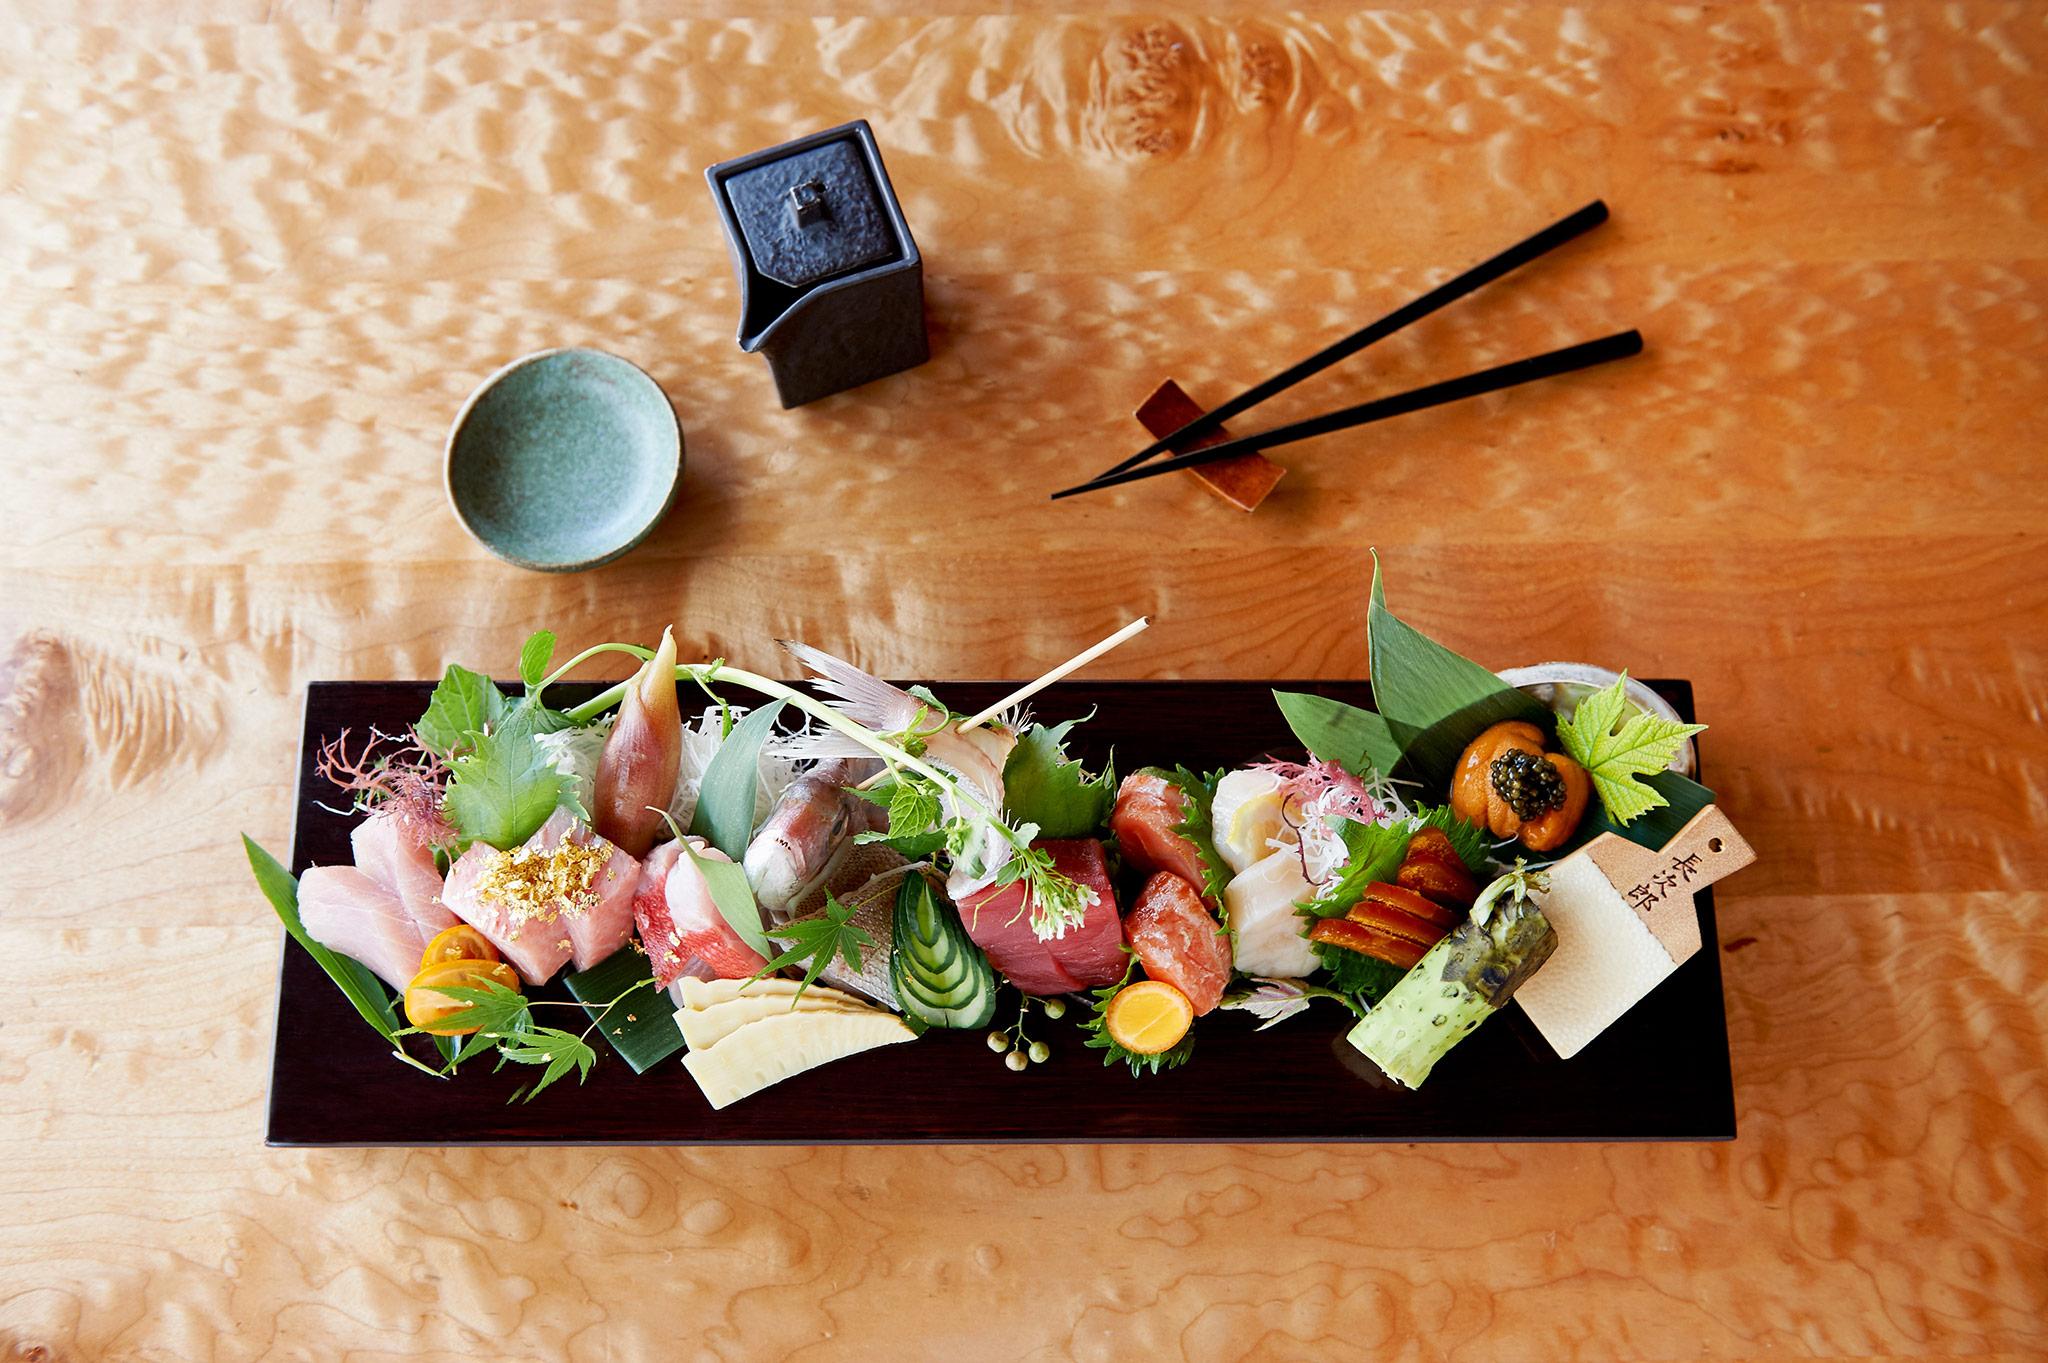 Sushi from Sushi Ran